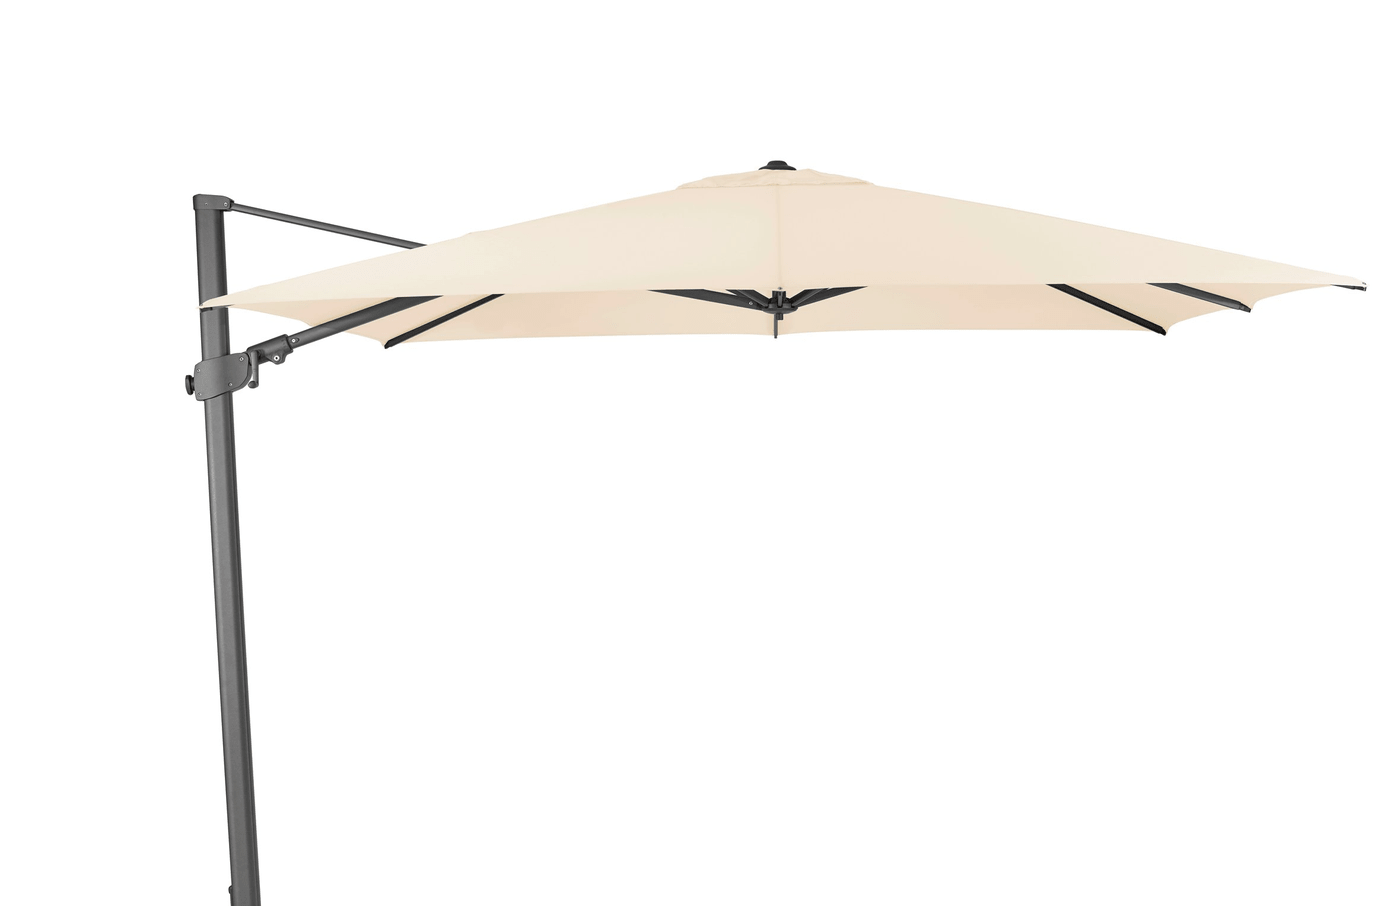 Glatz Ombrelloni Prezzi.Suncomfort By Glatz Varioflex Ombrellone 300 X 300